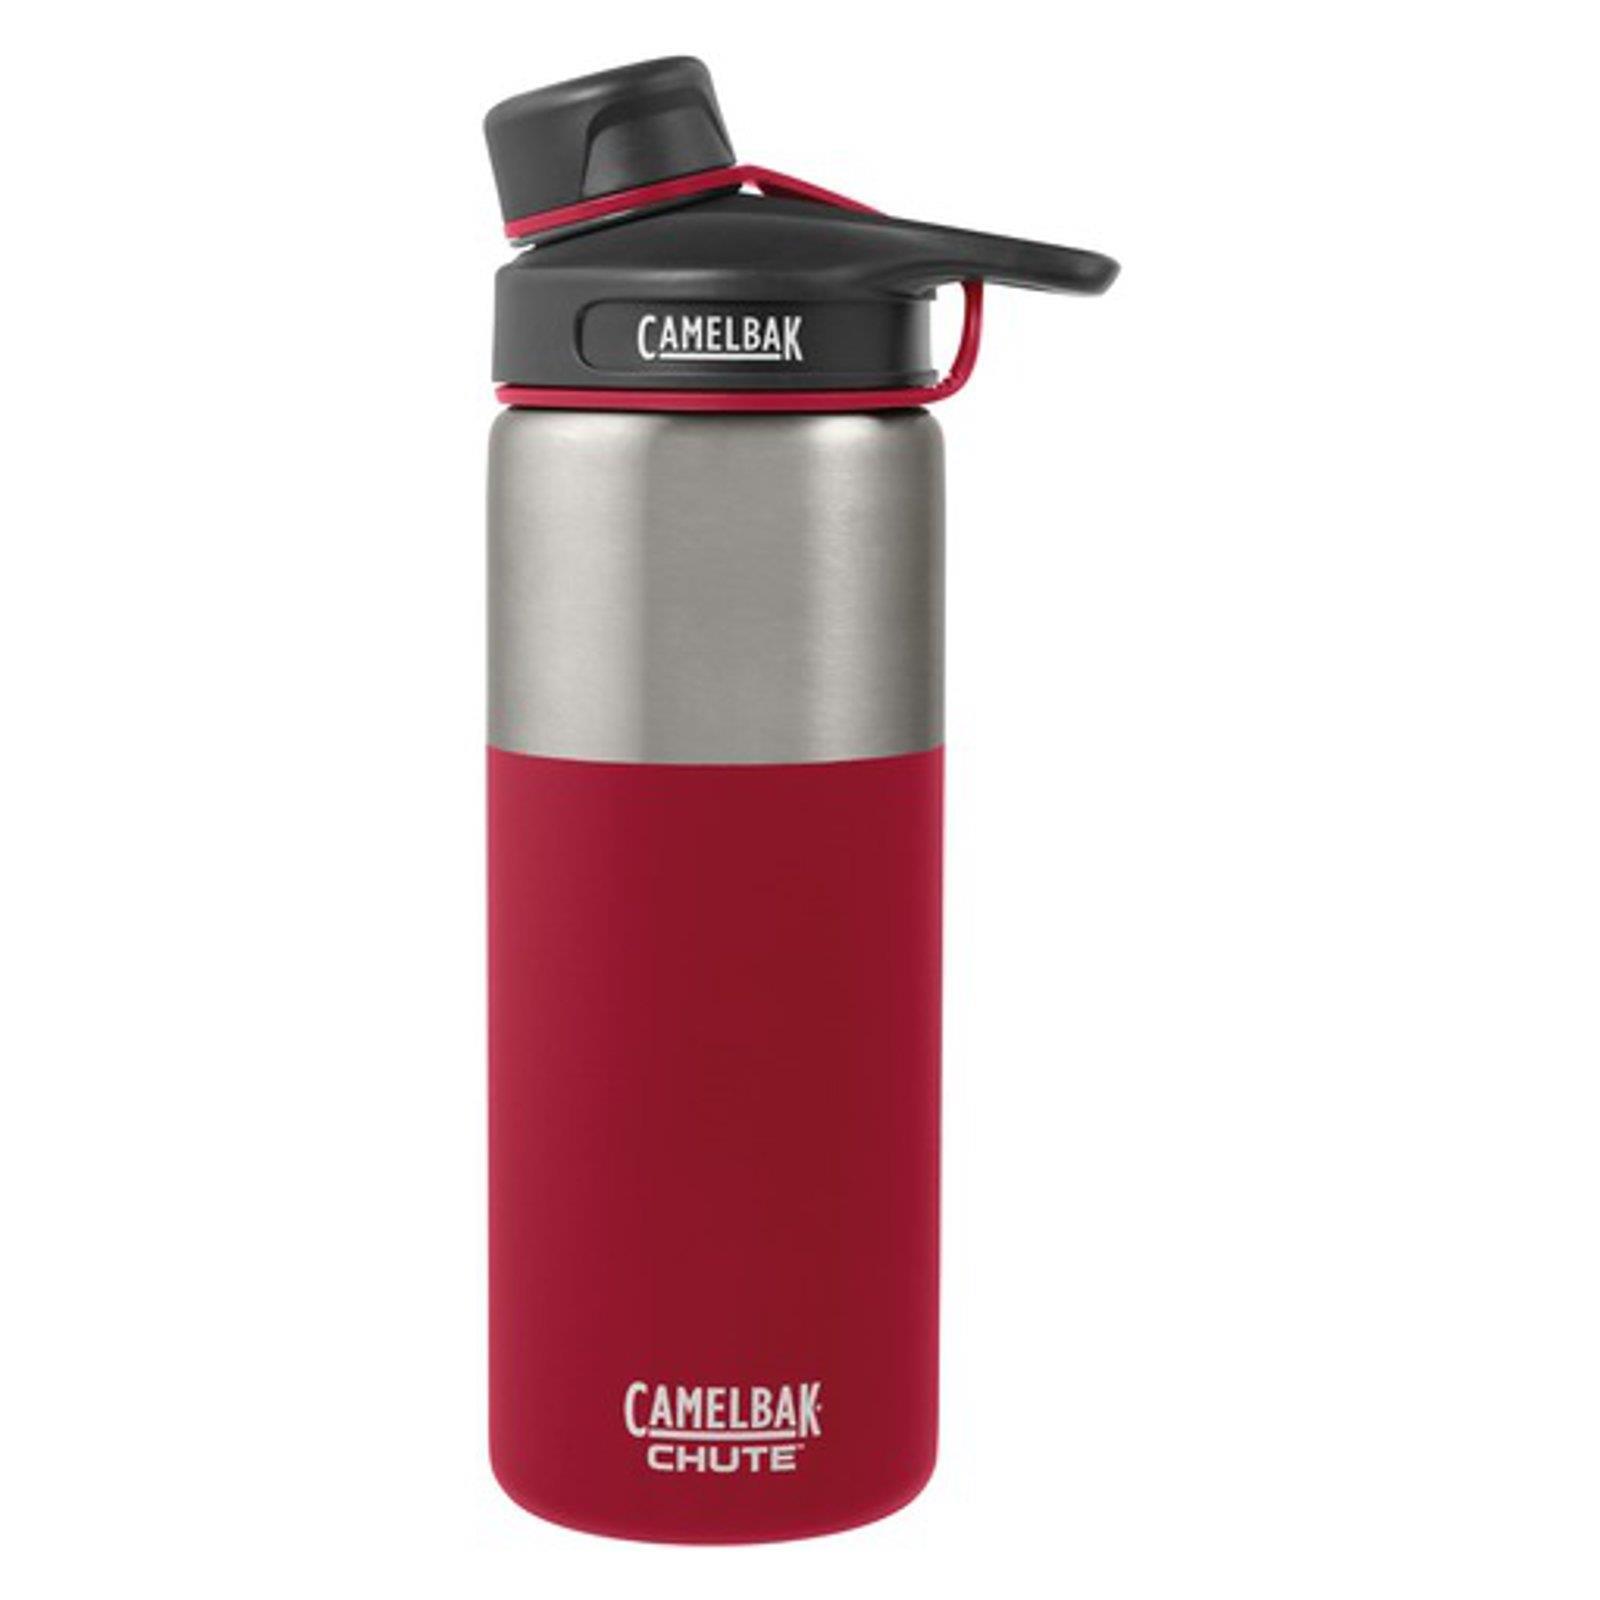 Camelbak-Trink-Isolier-Flasche-Chute-Vacuum-Thermo-Becher-Kanne-Outdoor Indexbild 16